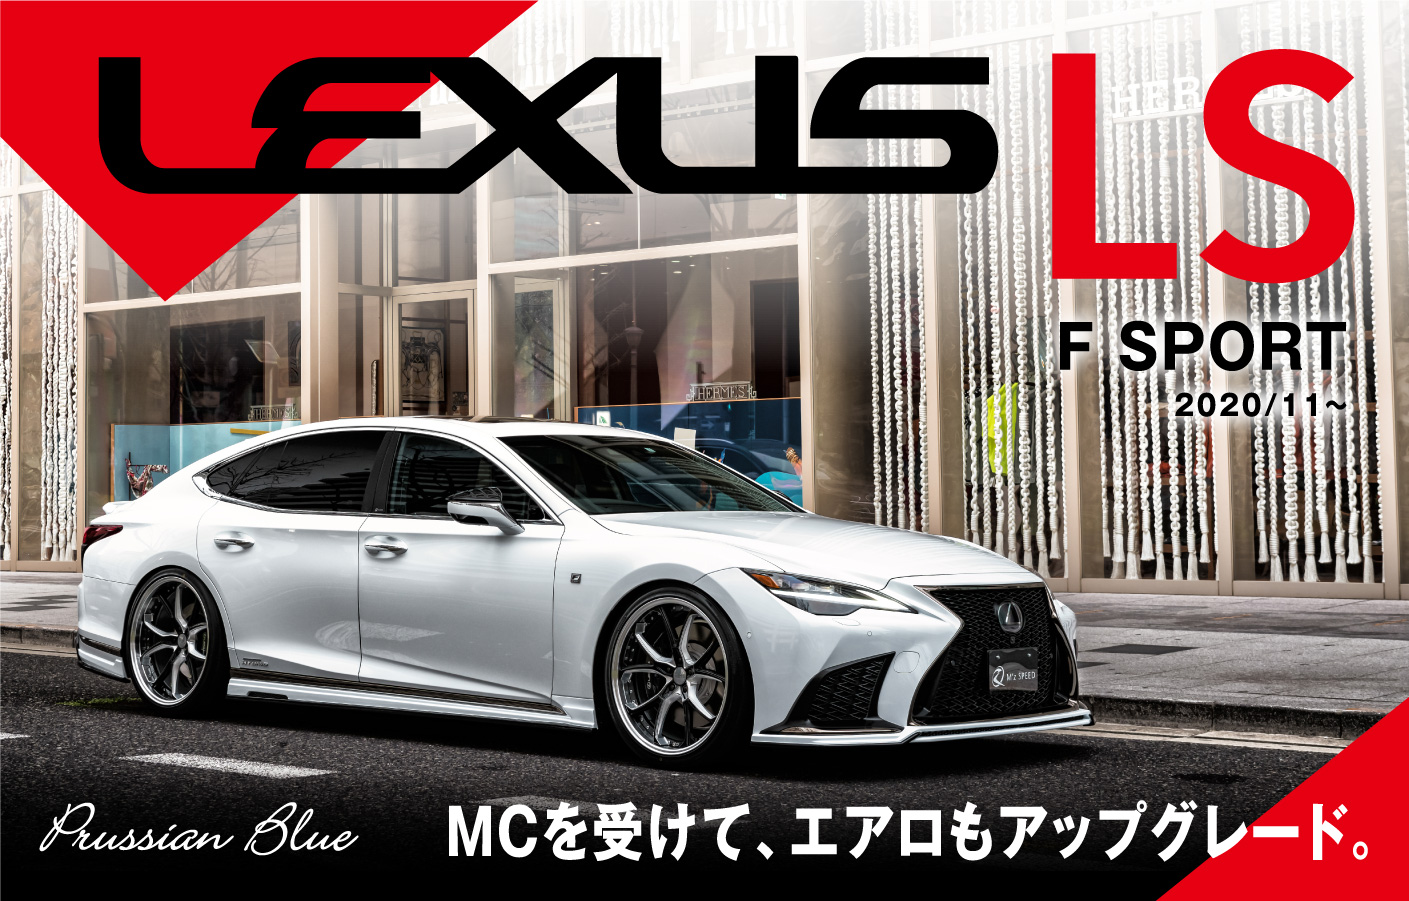 LEXUS LS F SPORT 2020/11~ Prussian Blue MCを受けて、エアロもアップグレード。